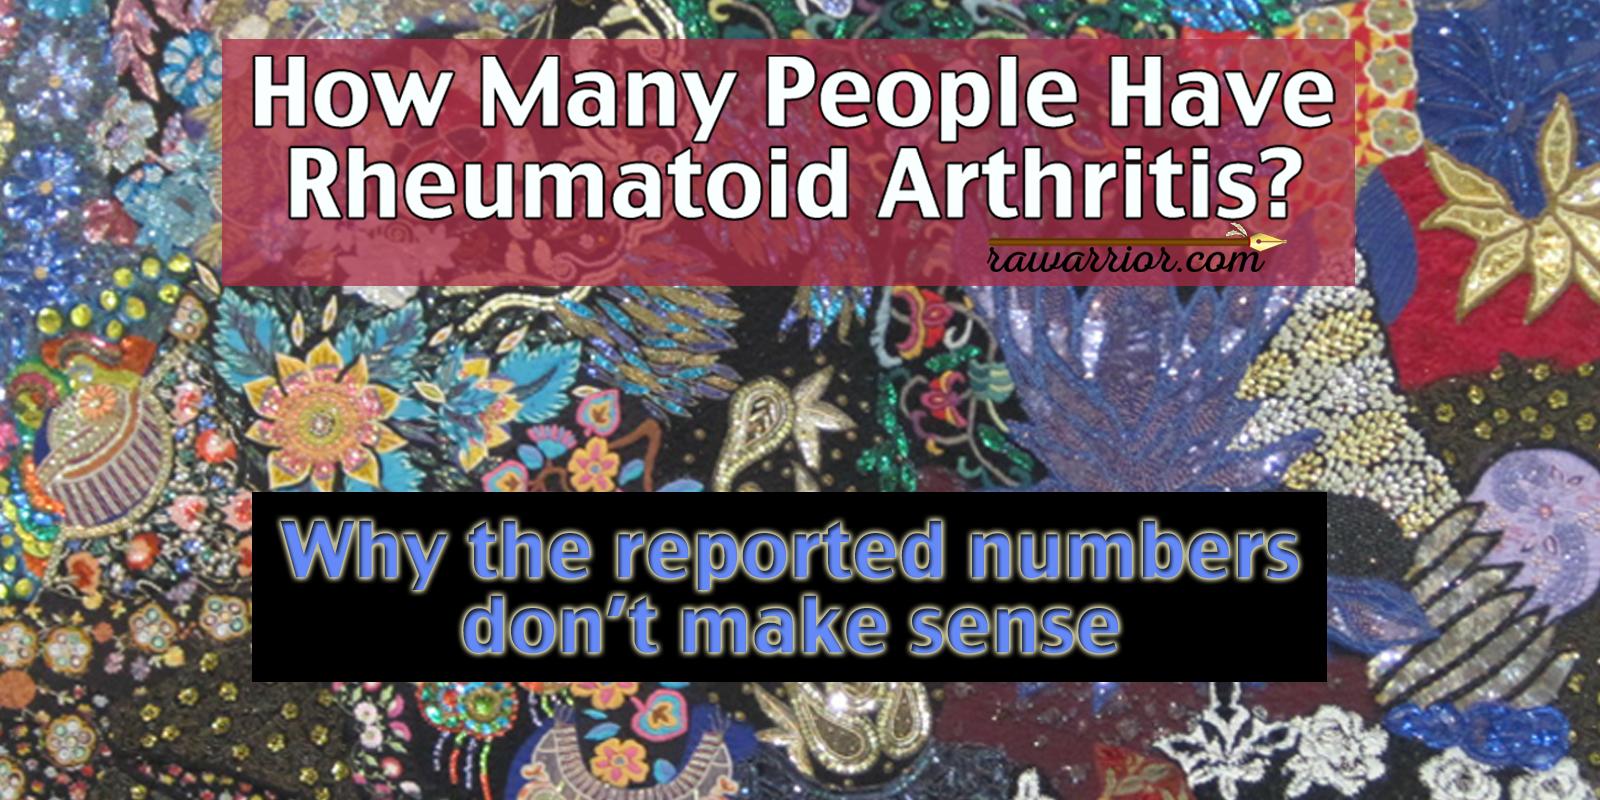 How Many People Have Rheumatoid Arthritis